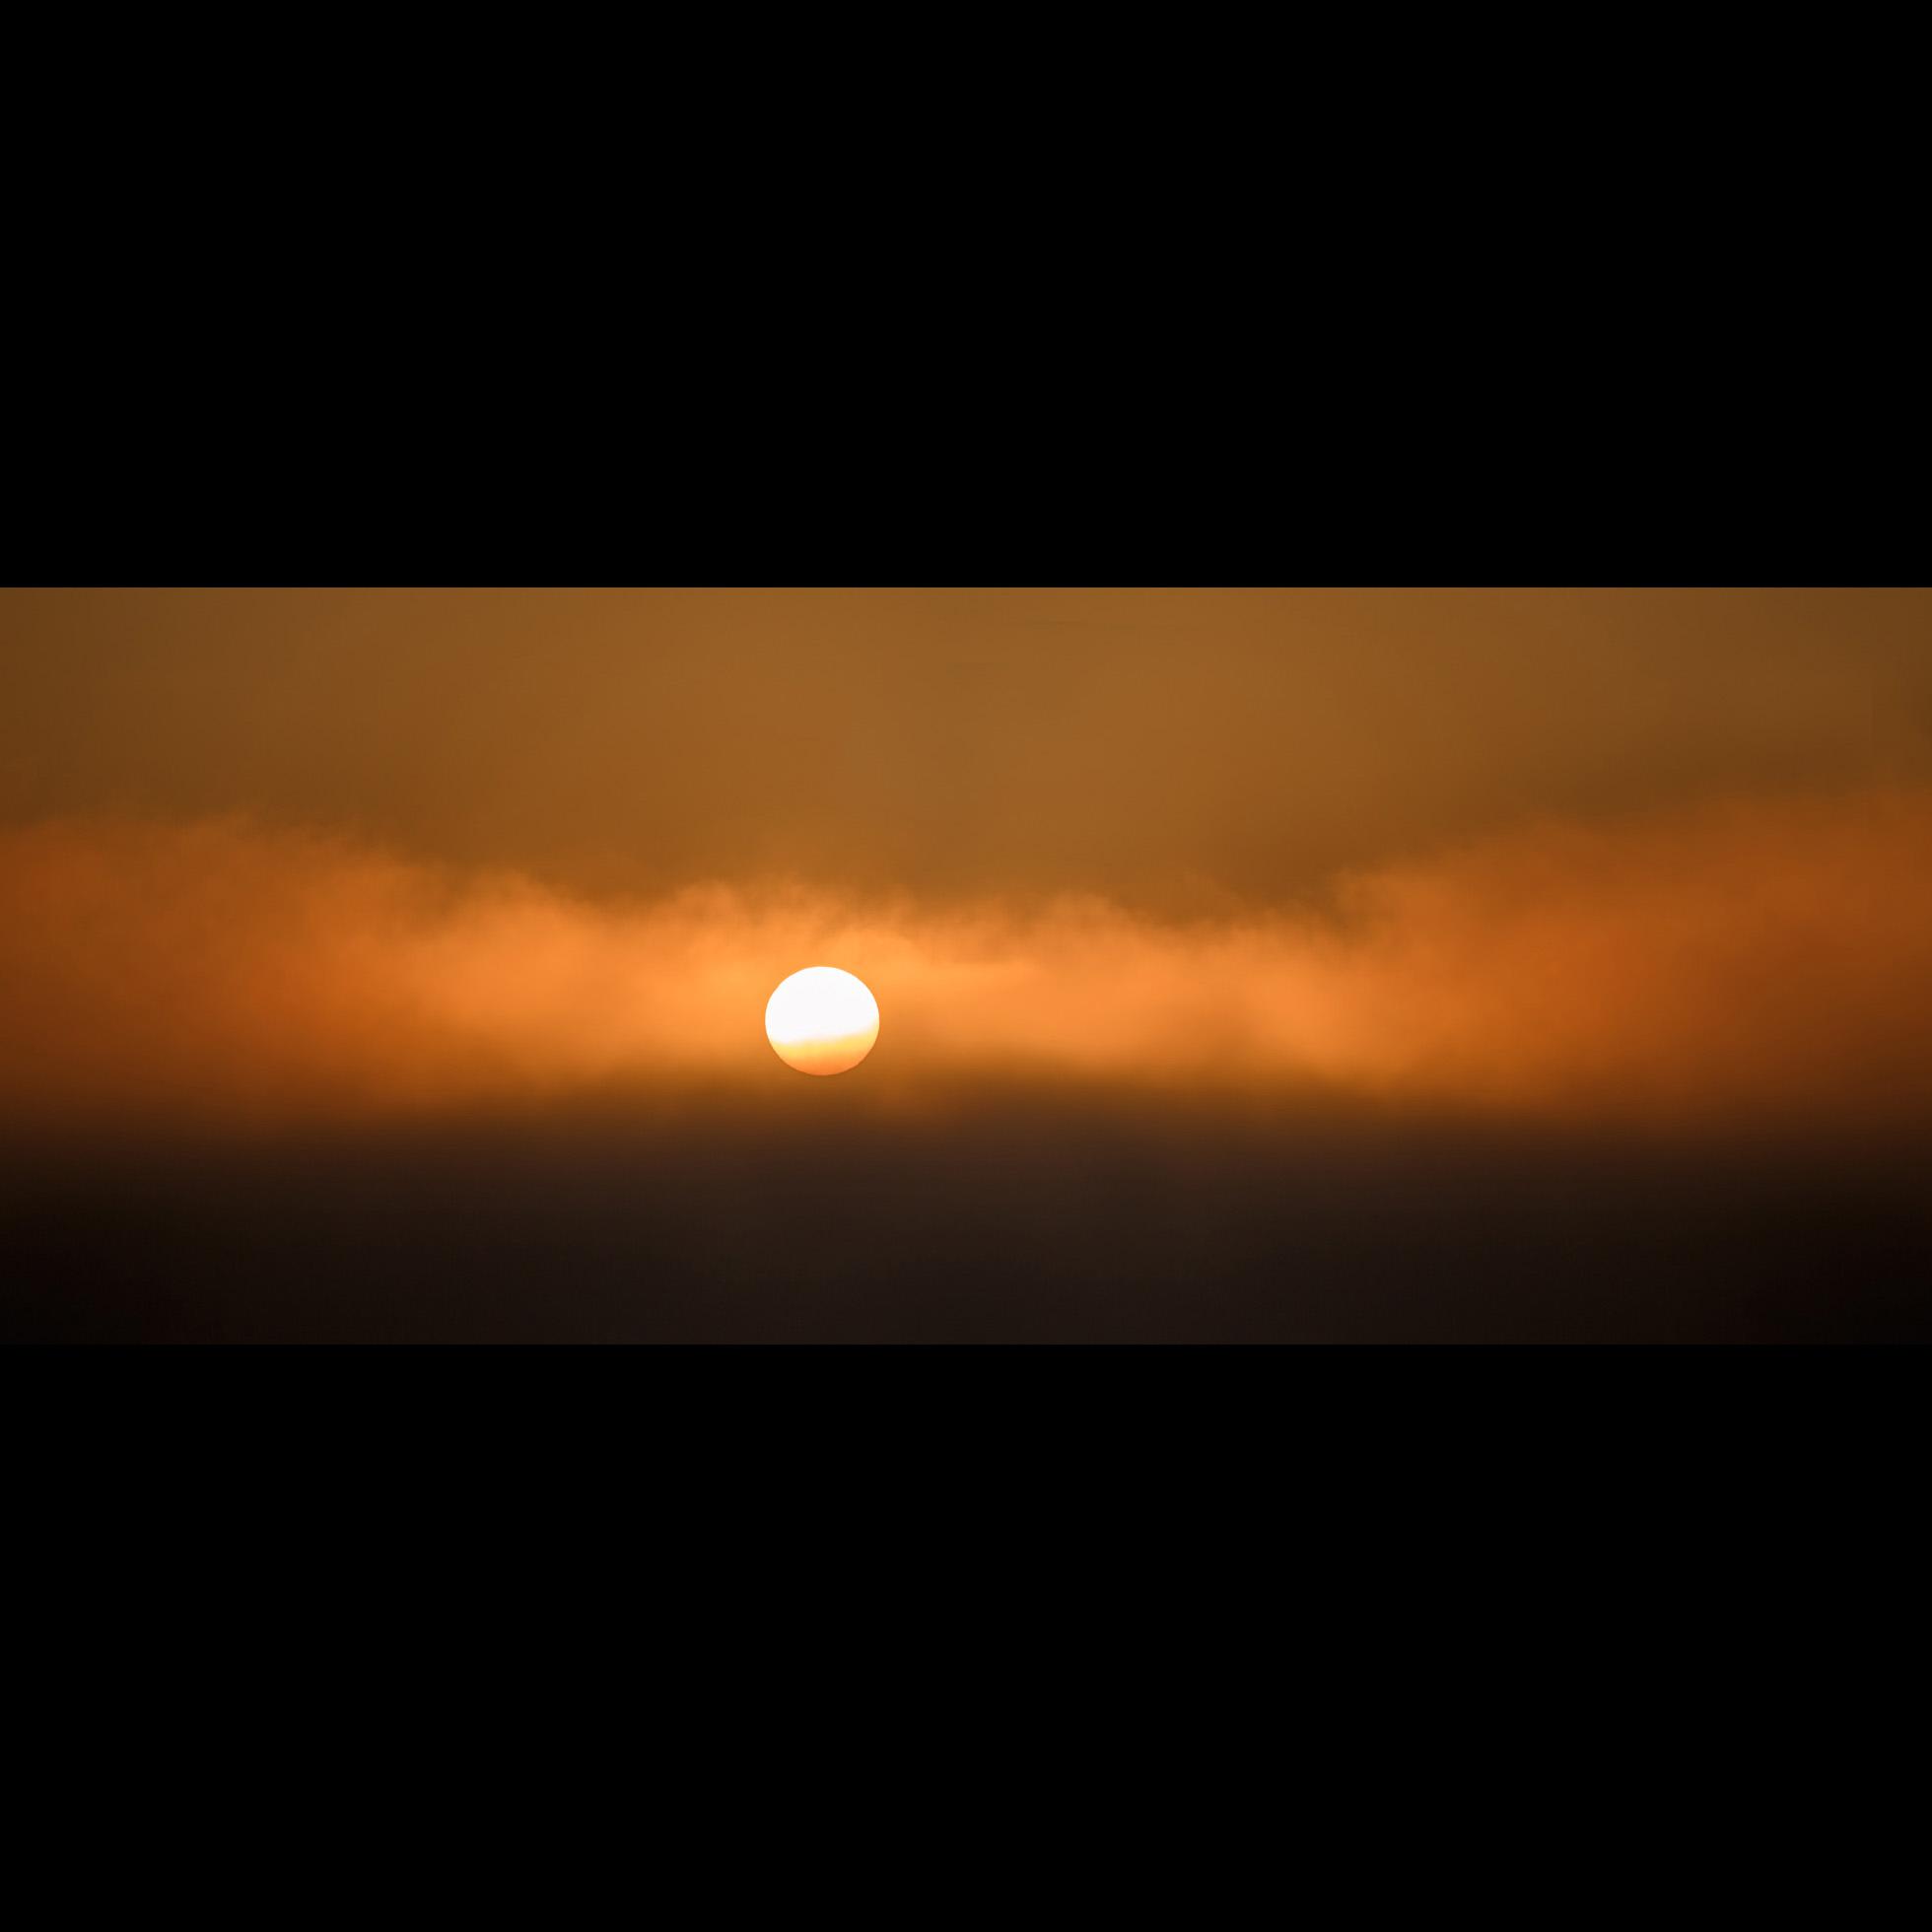 6.29 FERRY SUNSET